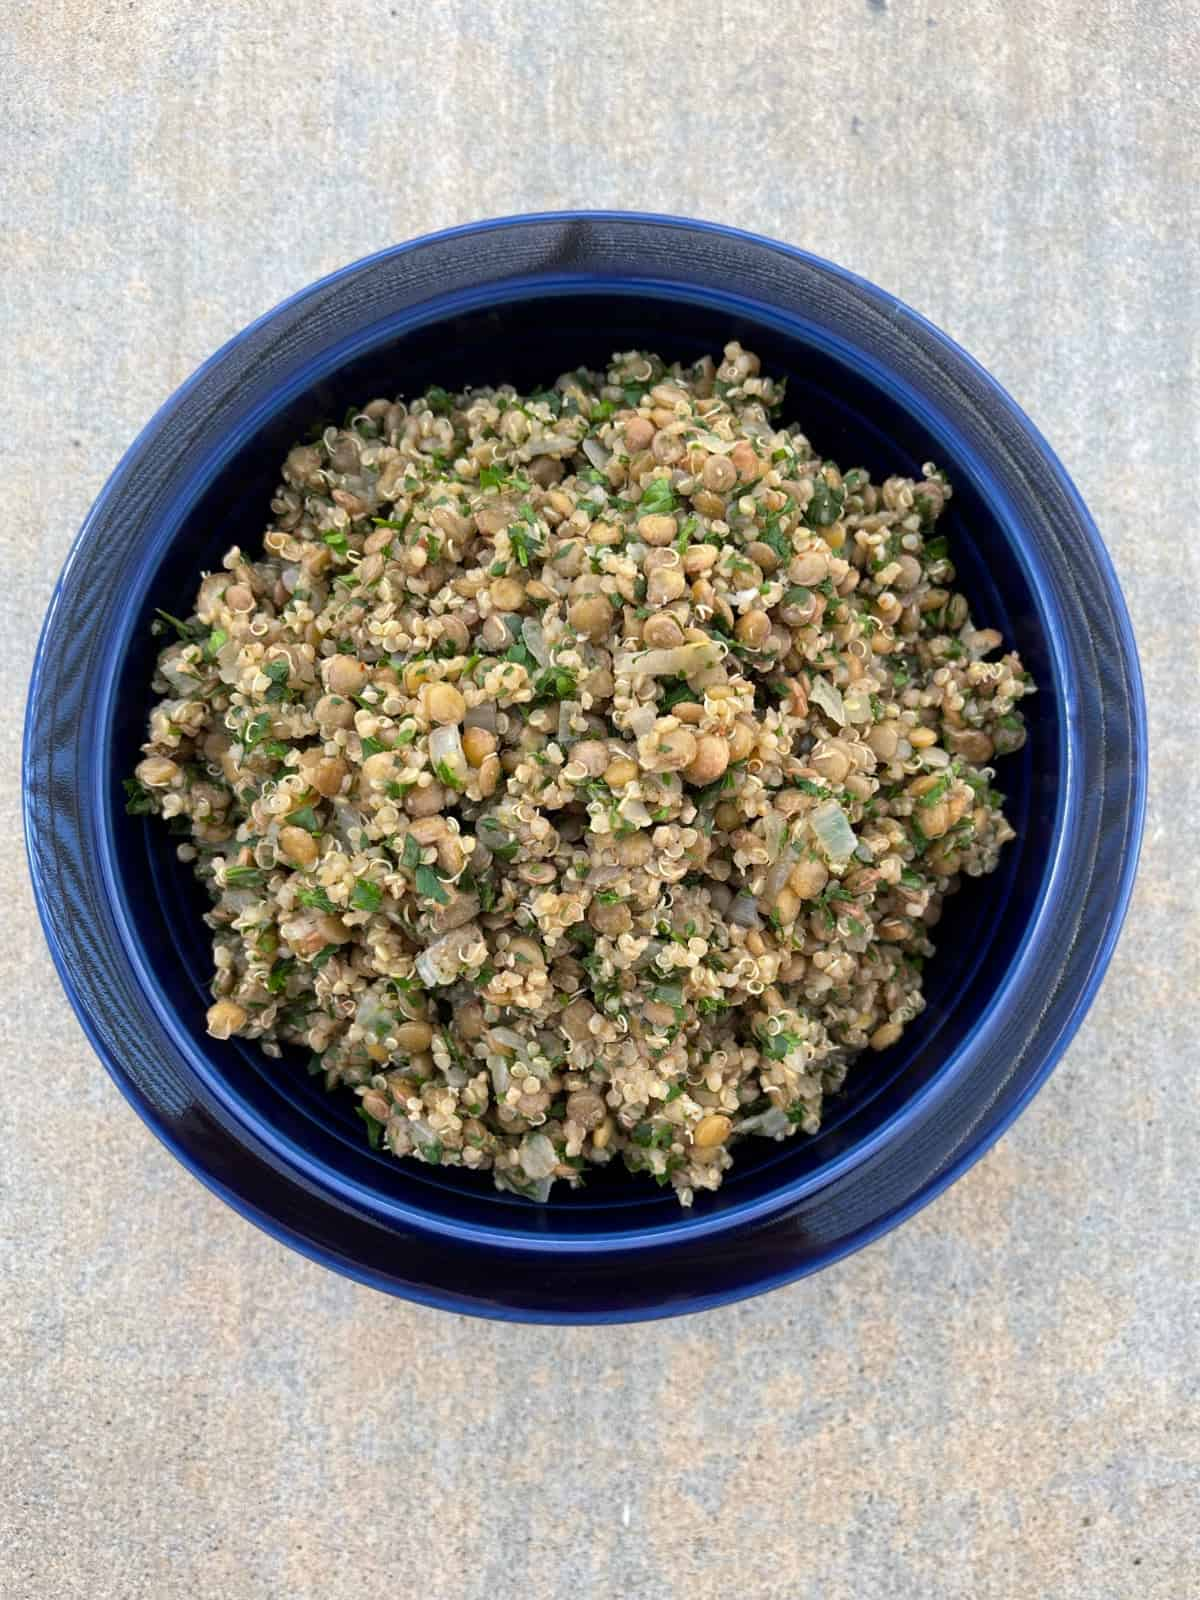 Mediterranean lentil quinoa lettuce wraps served family-style in blue bowl.